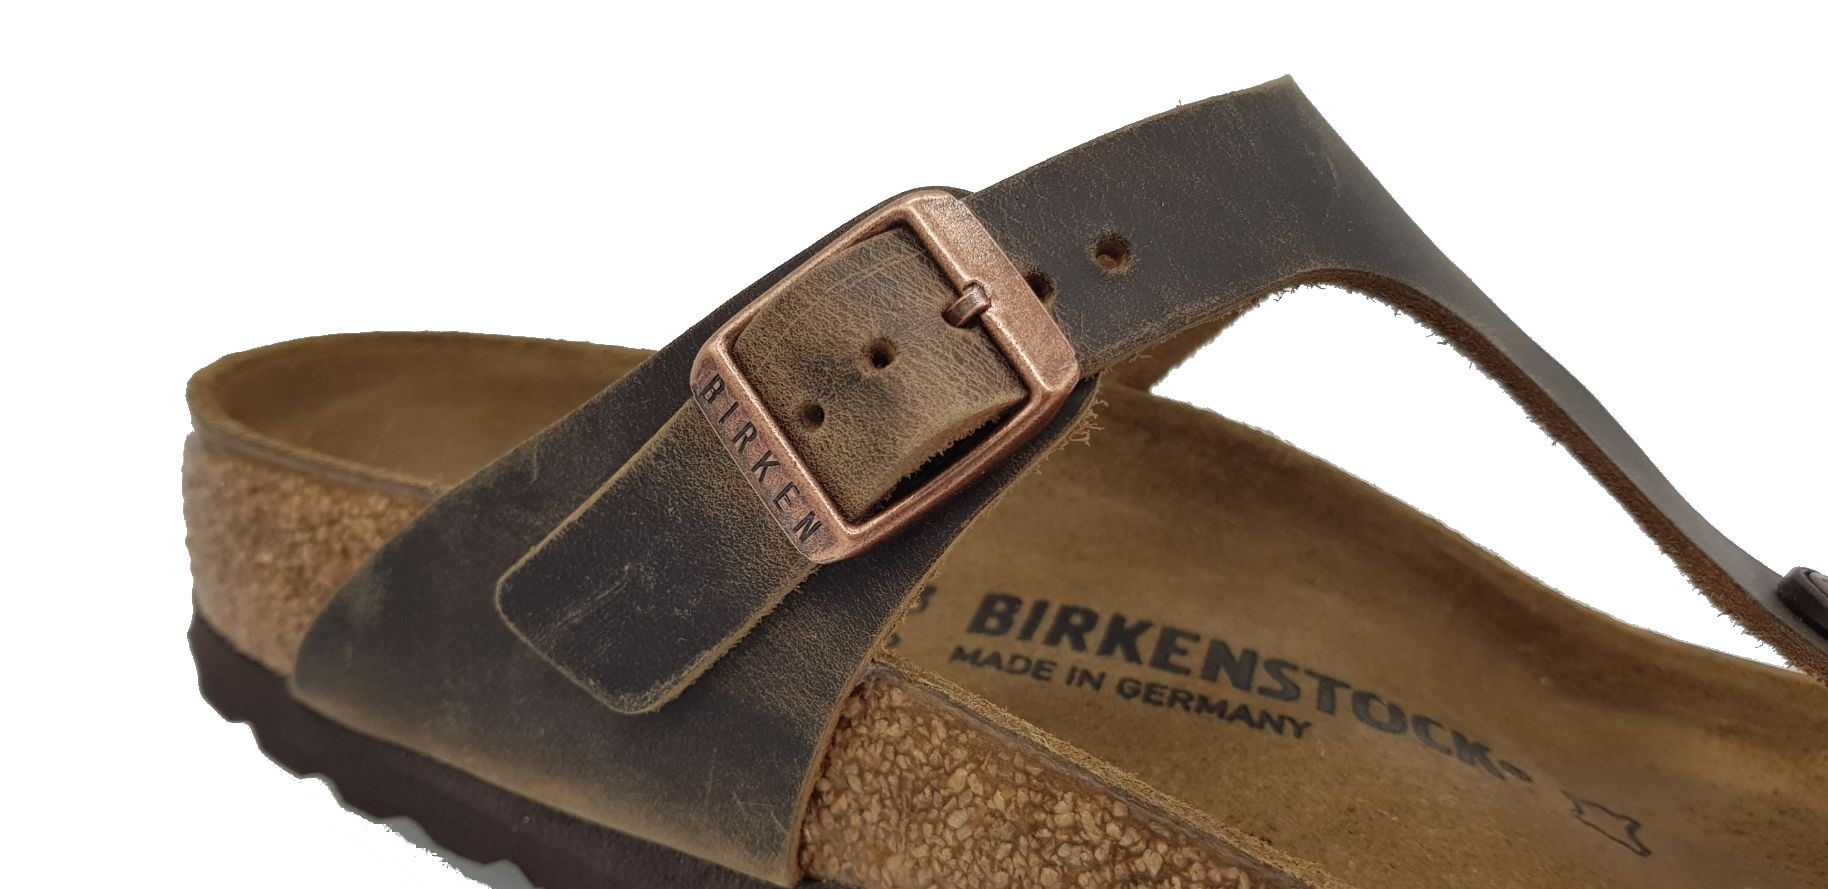 Birkenstock Gizeh Tabacco Brown Vintage